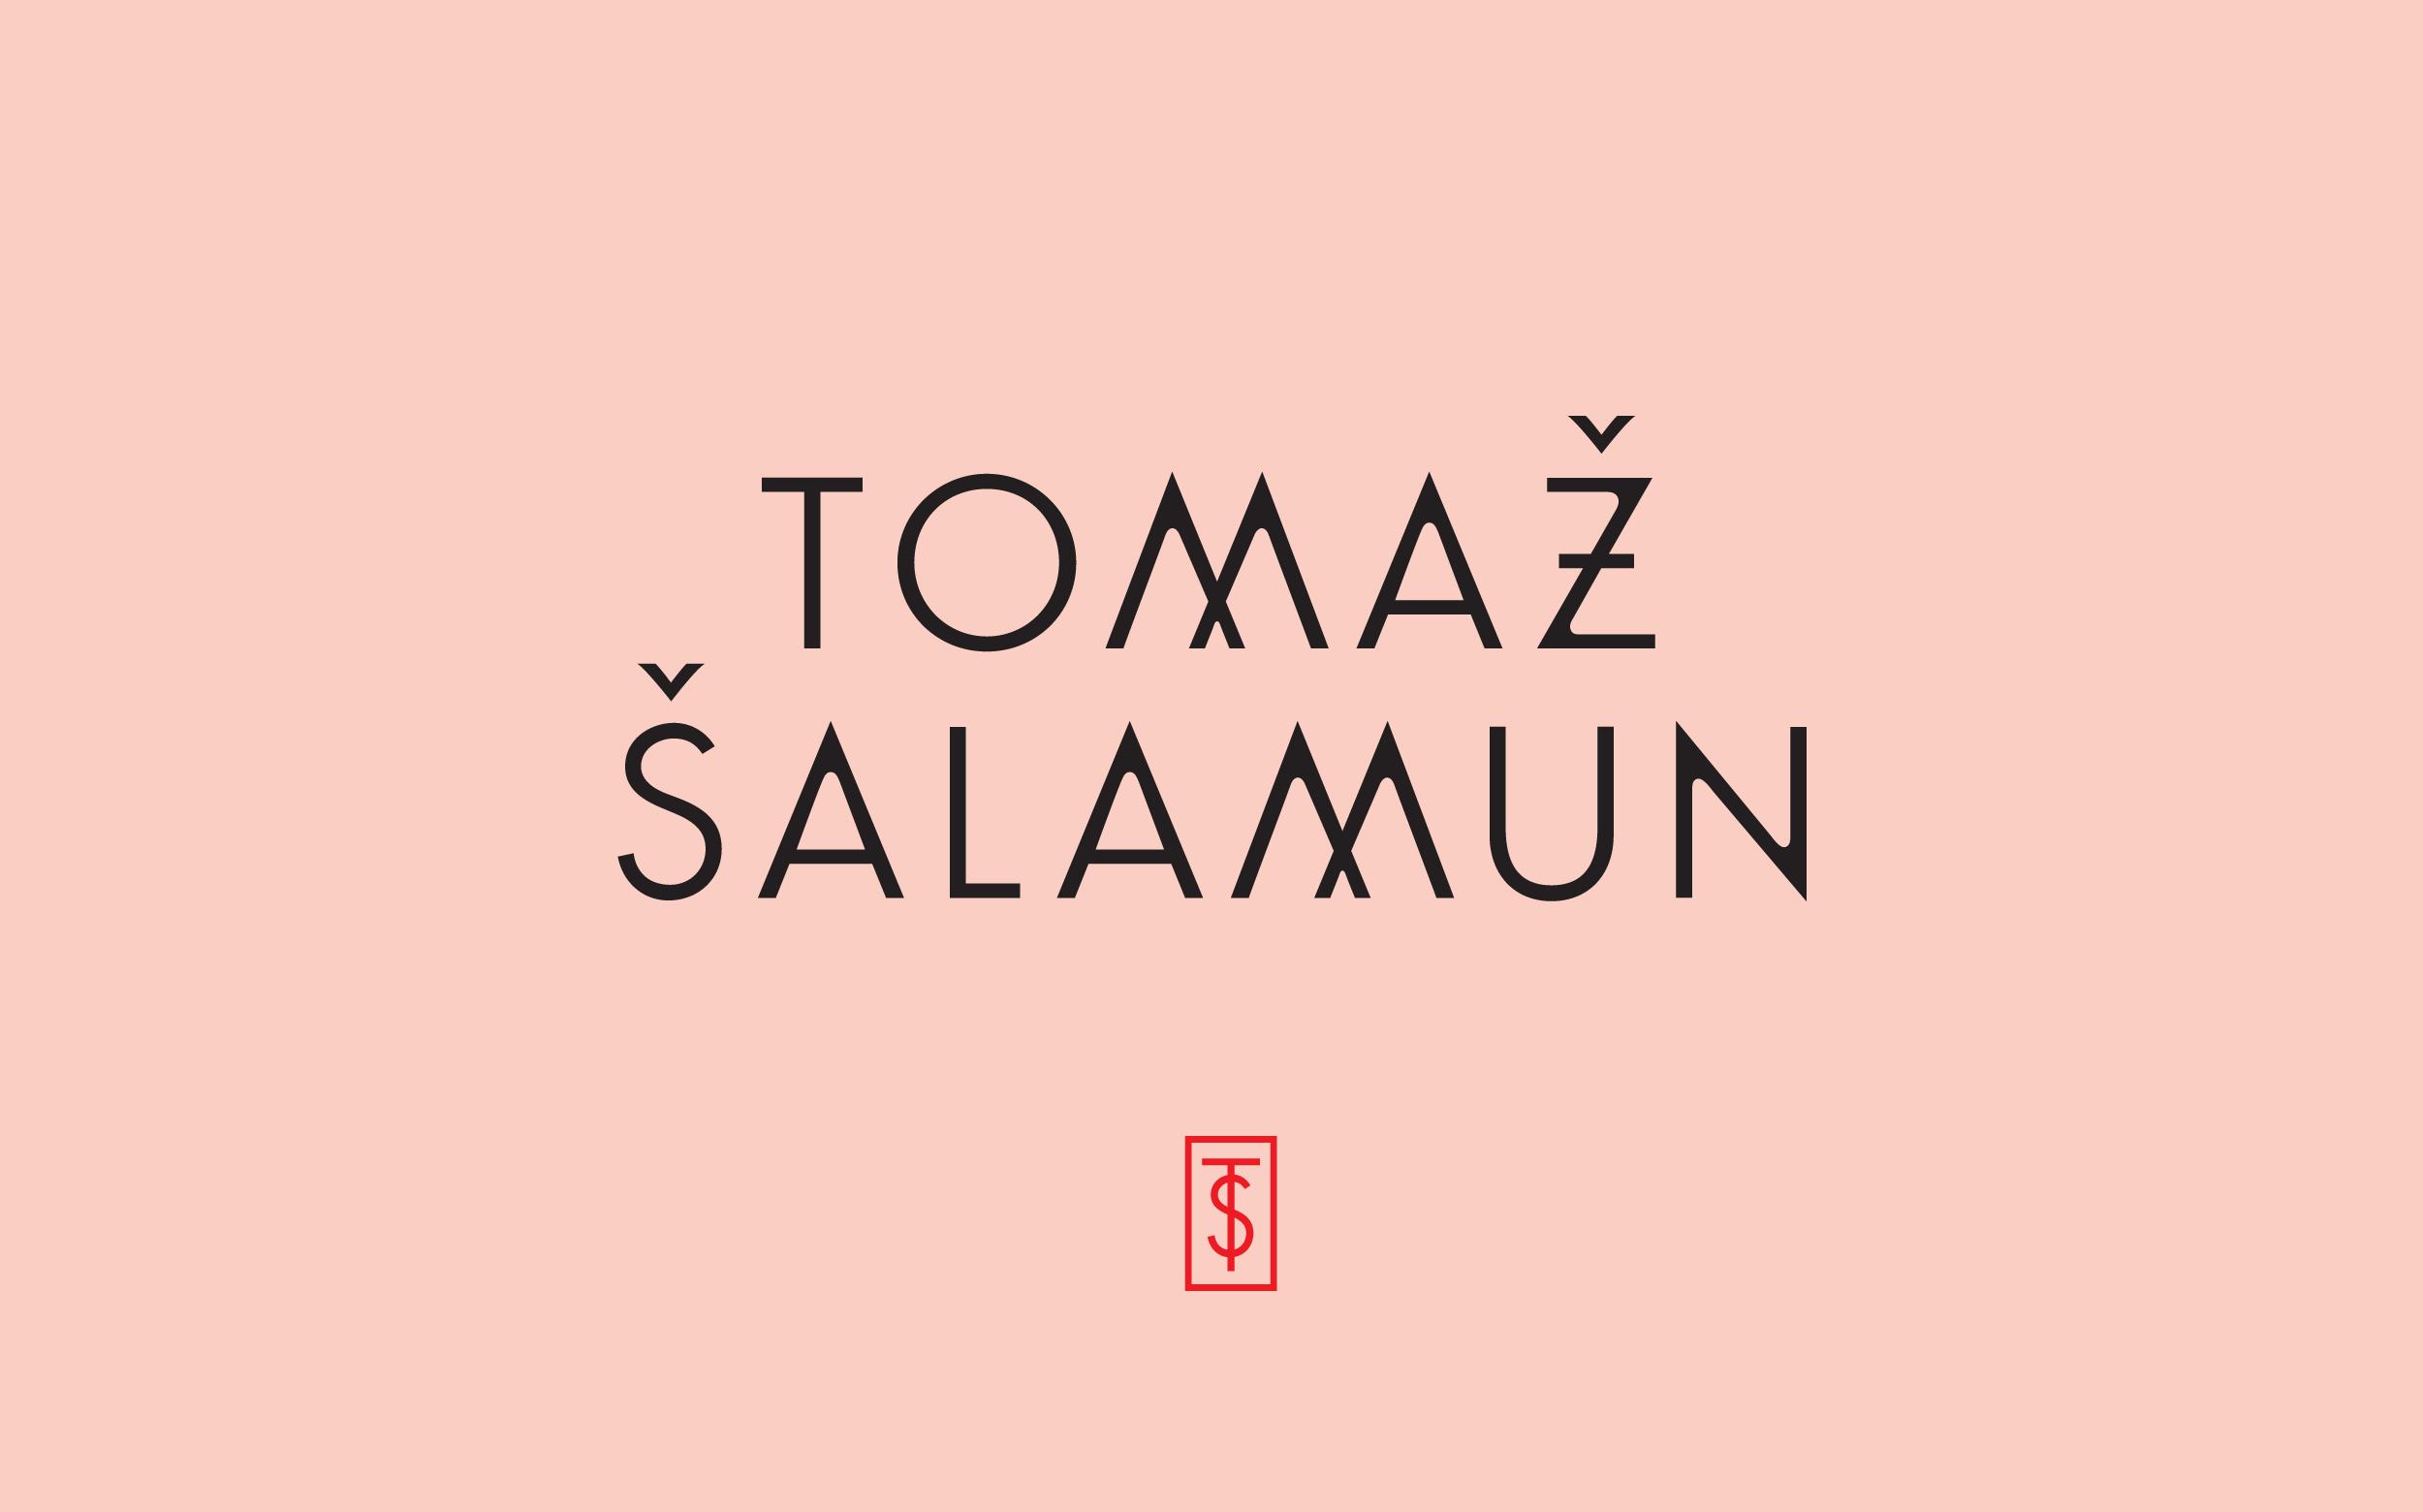 Tomaz Salamun logotype and monogram design by Abby Haddican Studio.